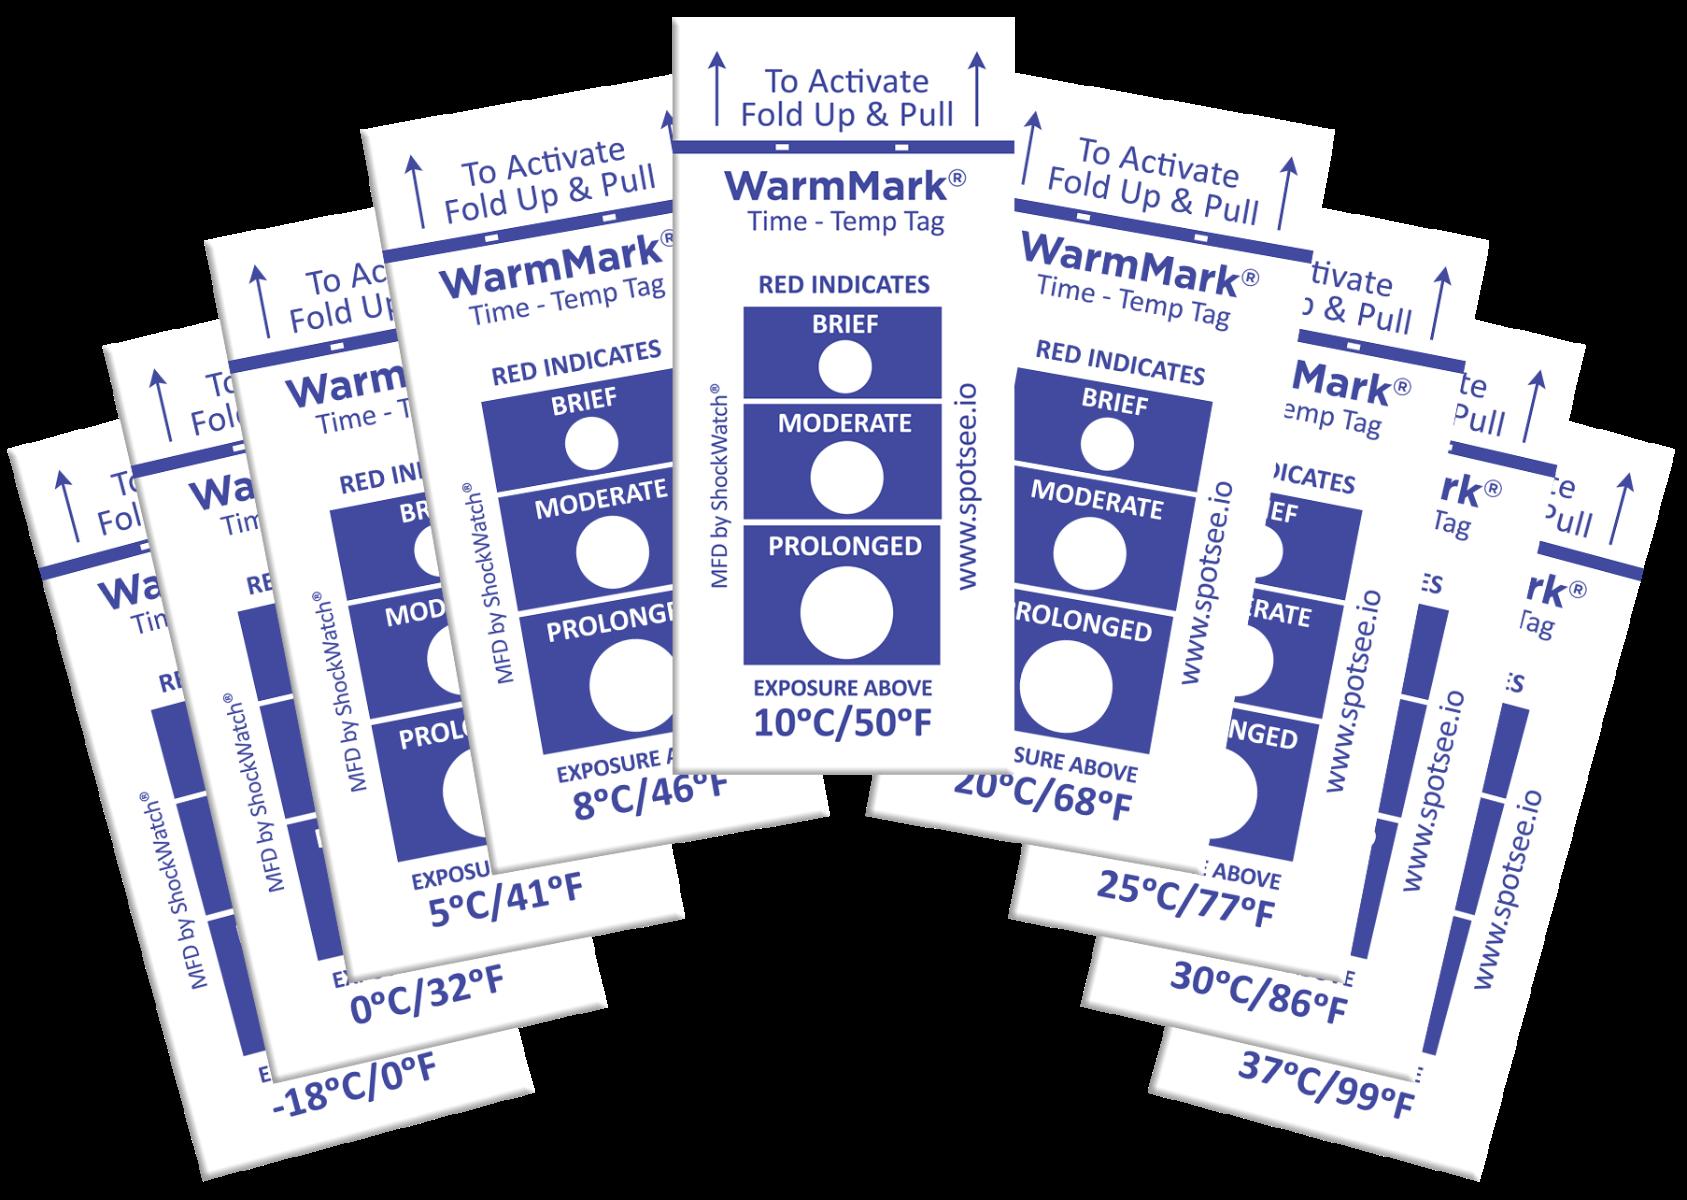 group photo of spotsee warmmark temperature indicators